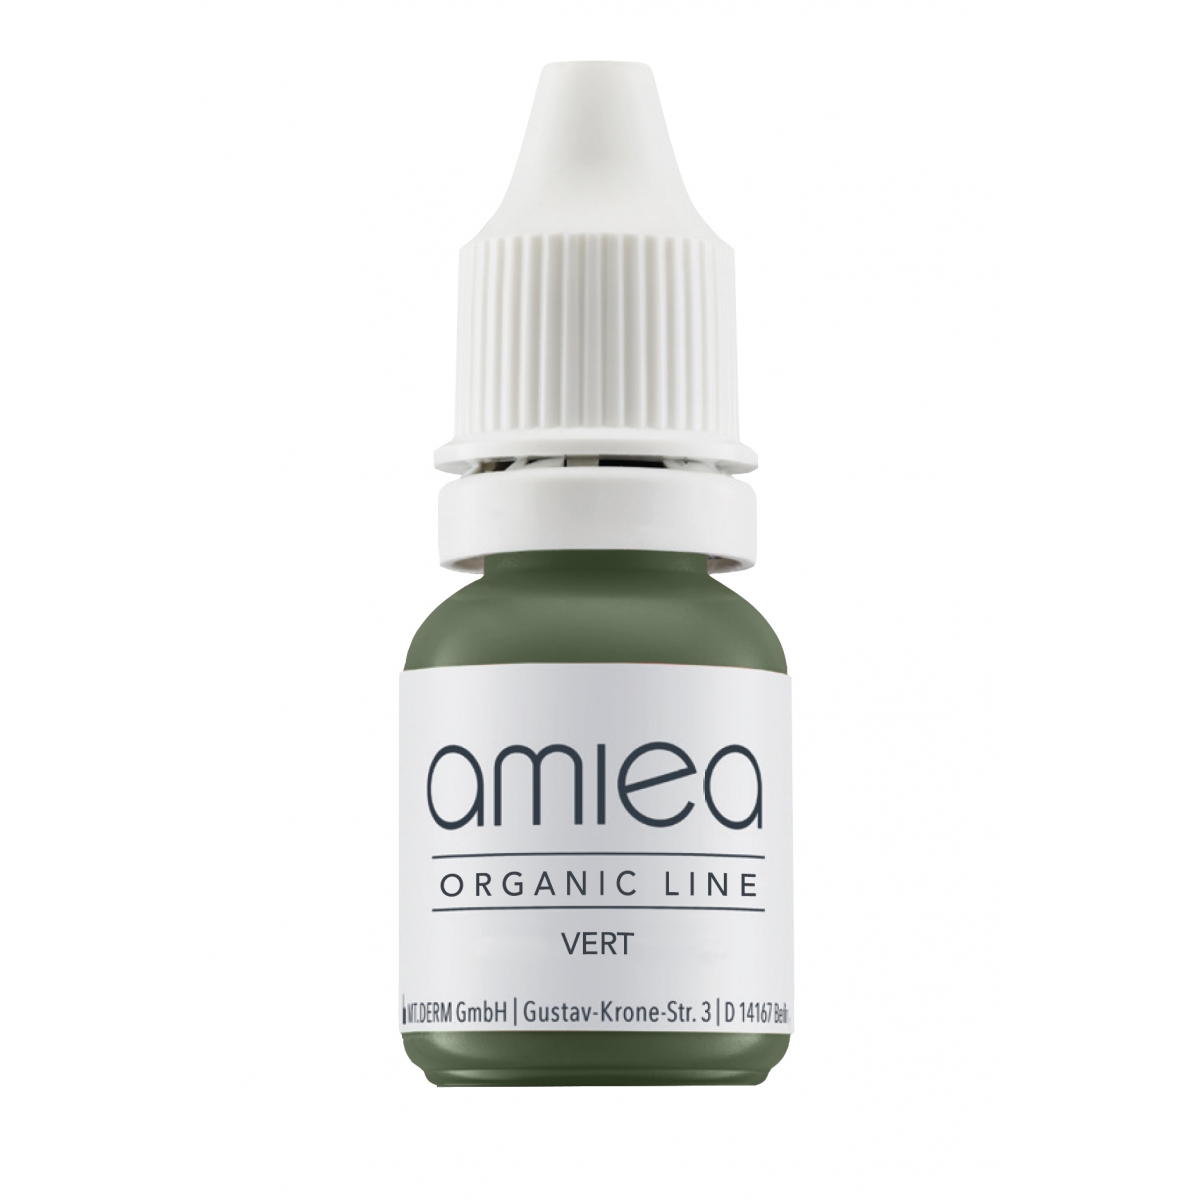 Organicline (5 ml)  - PIGMENTS AMIEA ORGANICLINE CORRECTEUR VERT, Flacon 5 ml